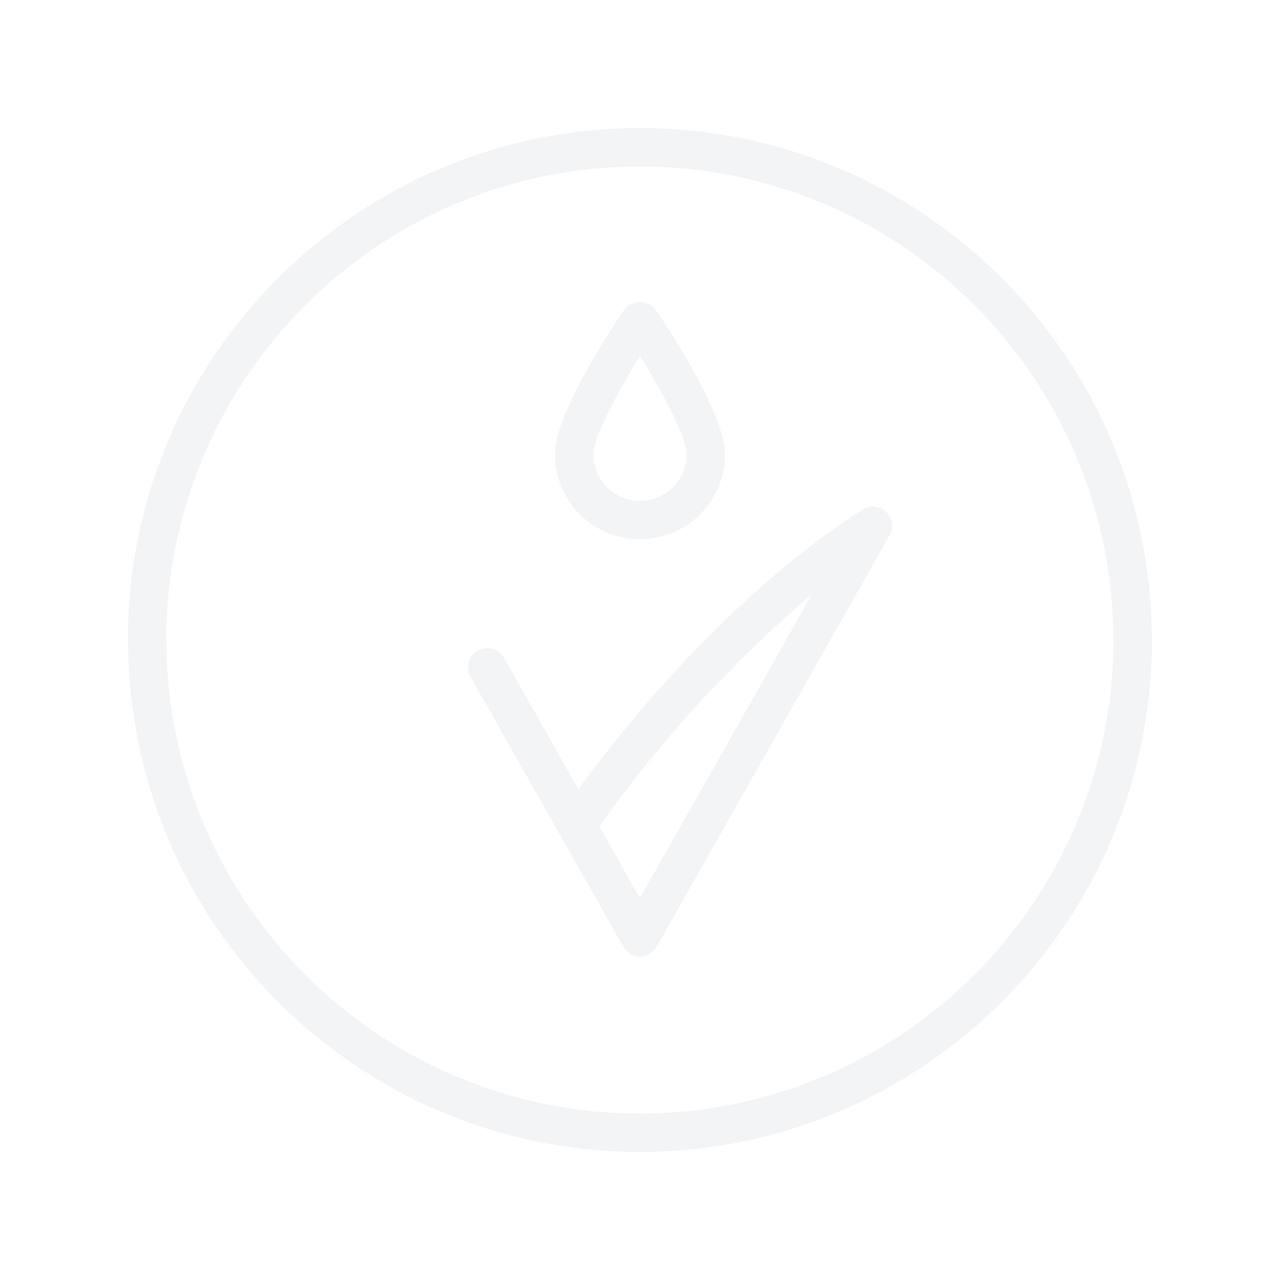 MAYBELLINE Color Sensational Loaded Bolds Lipstick No.886 Berry Bossy 3.9g